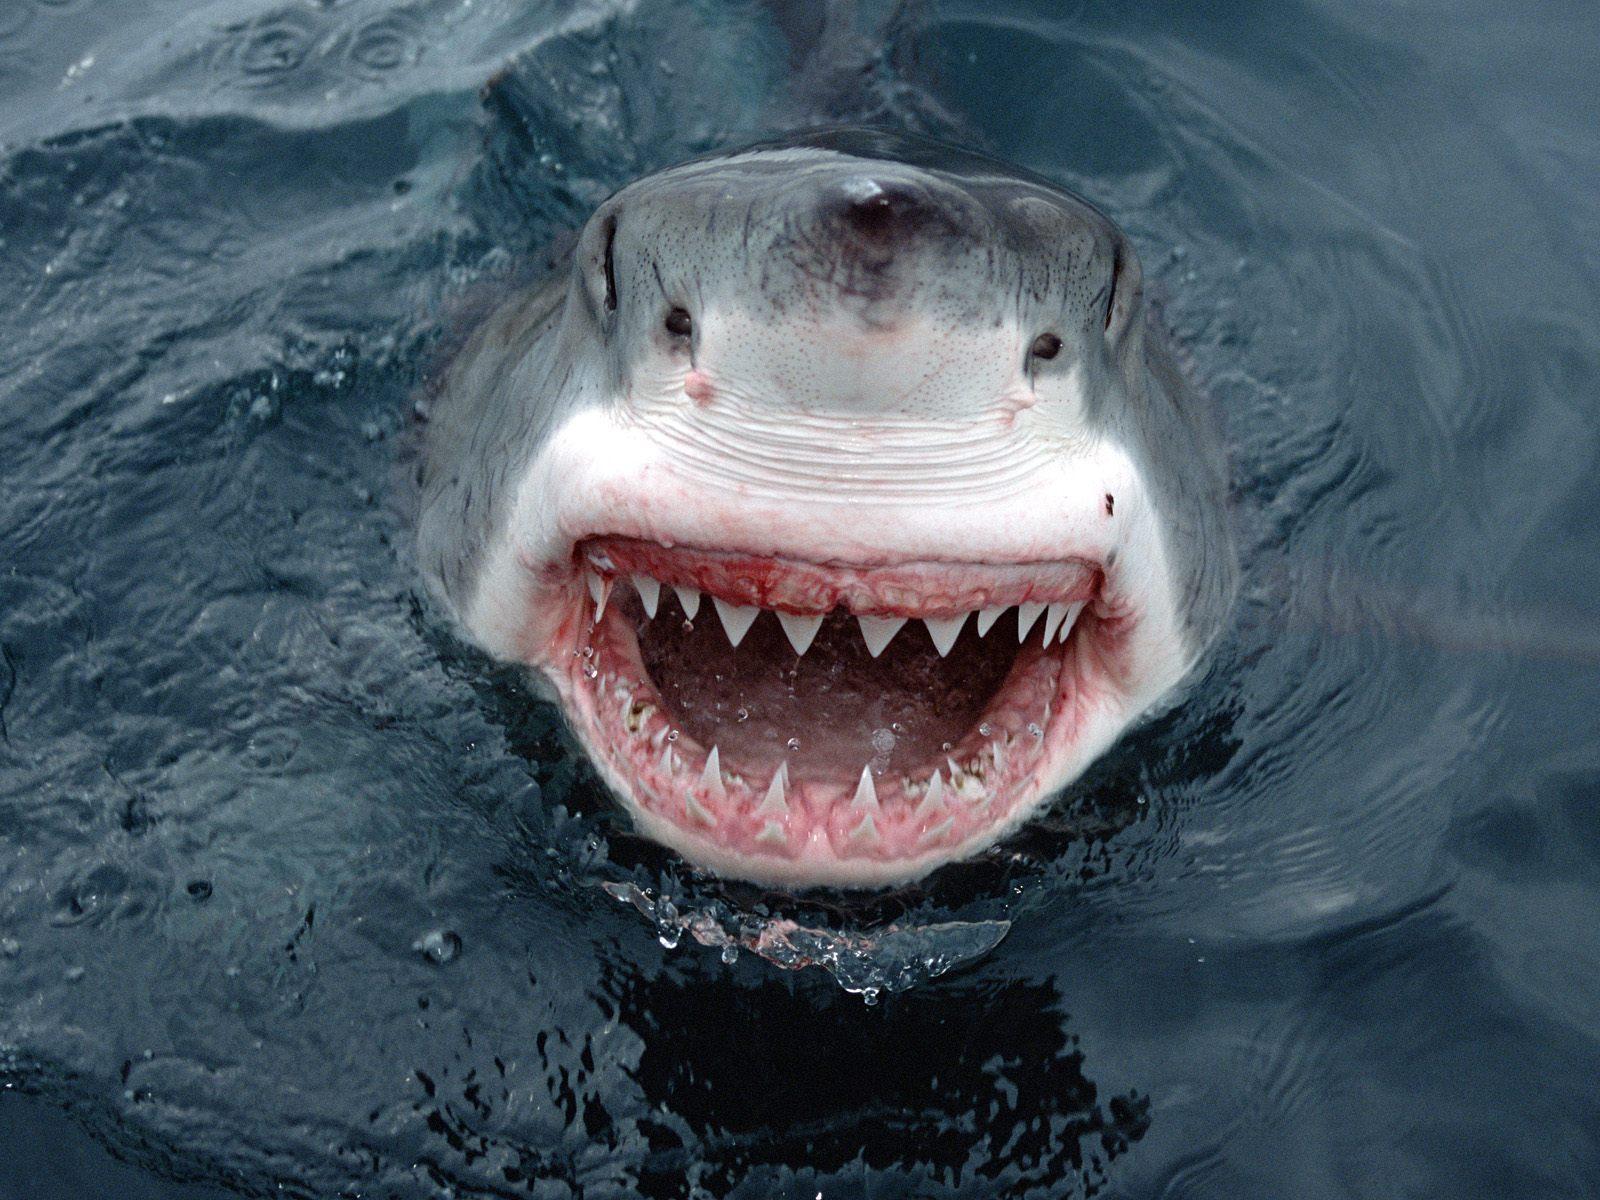 Акулы не чувствуют боли